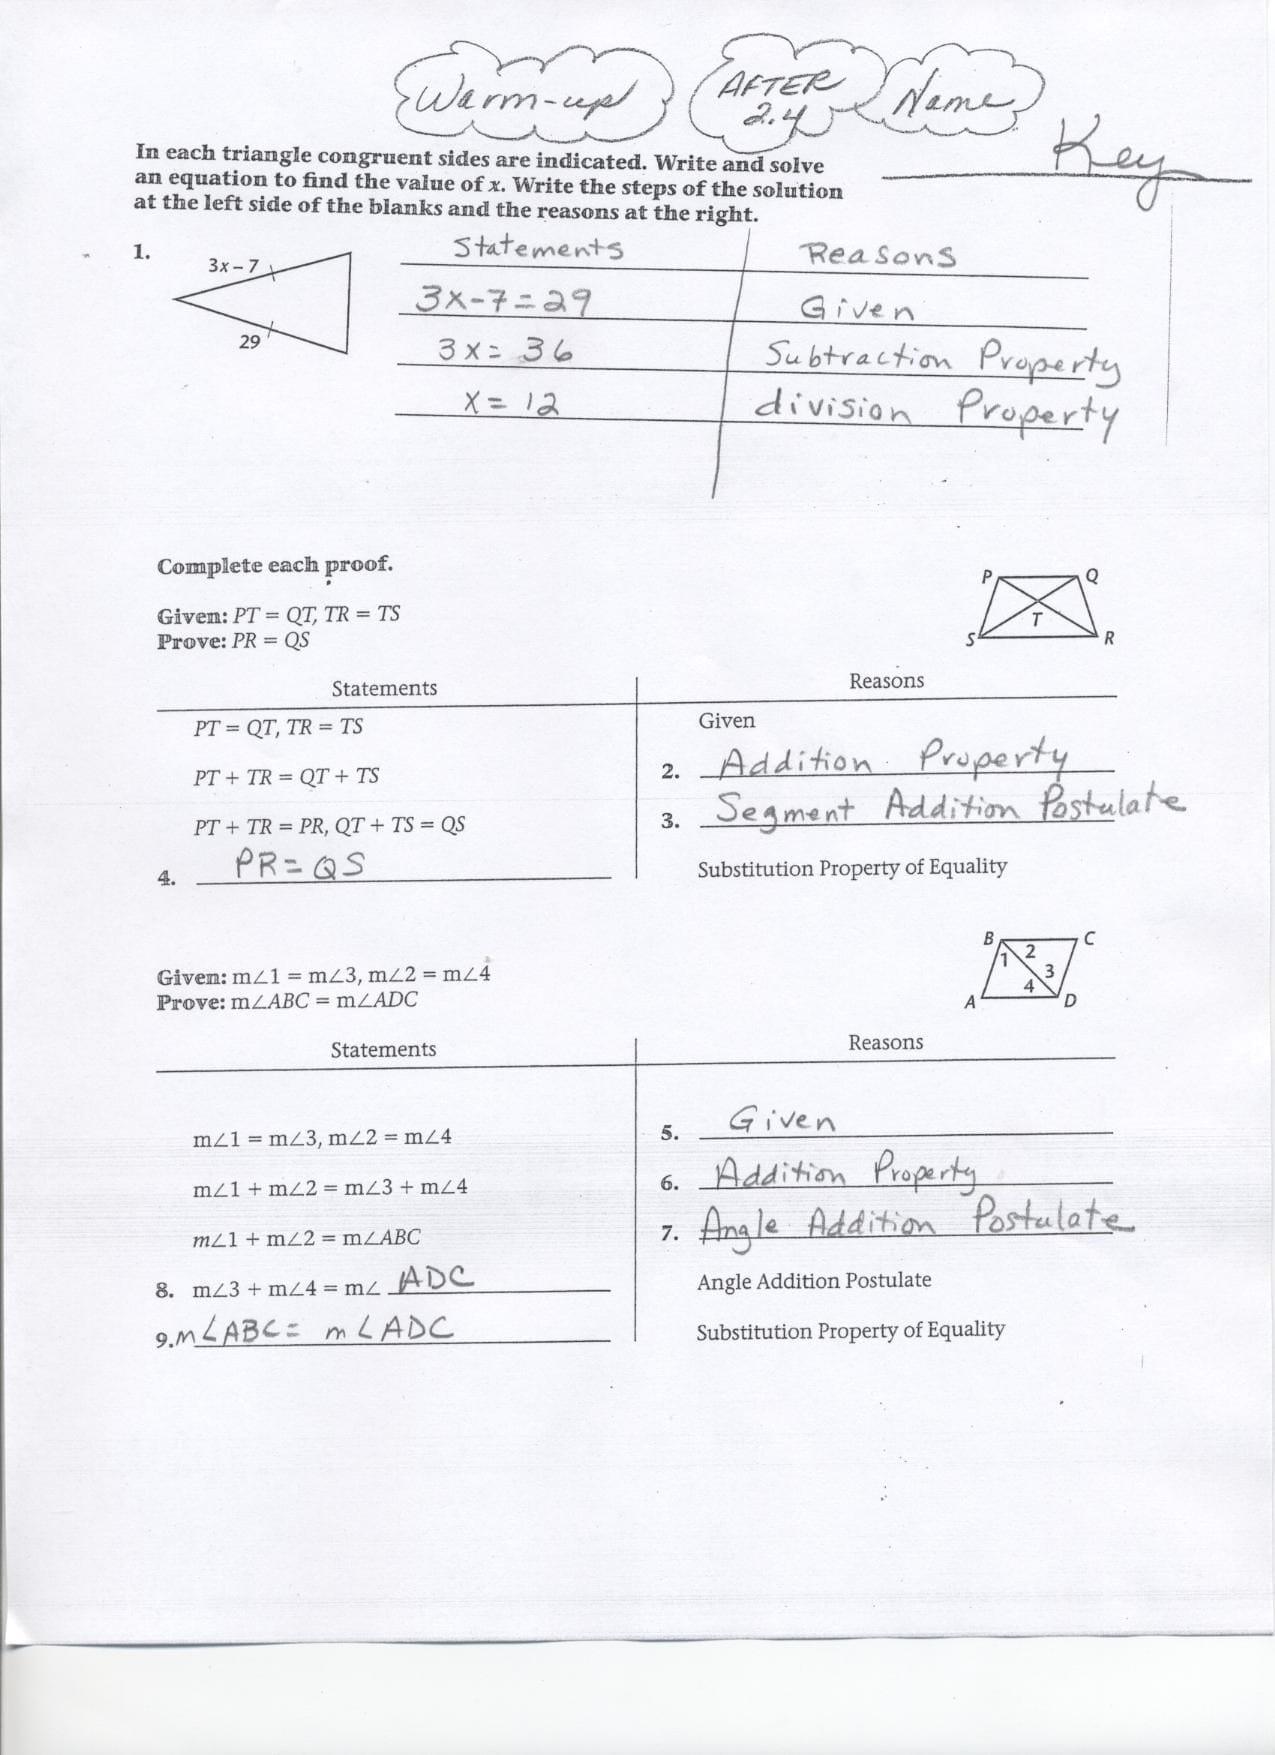 Geometry Segment And Angle Addition Worksheet Answer Key